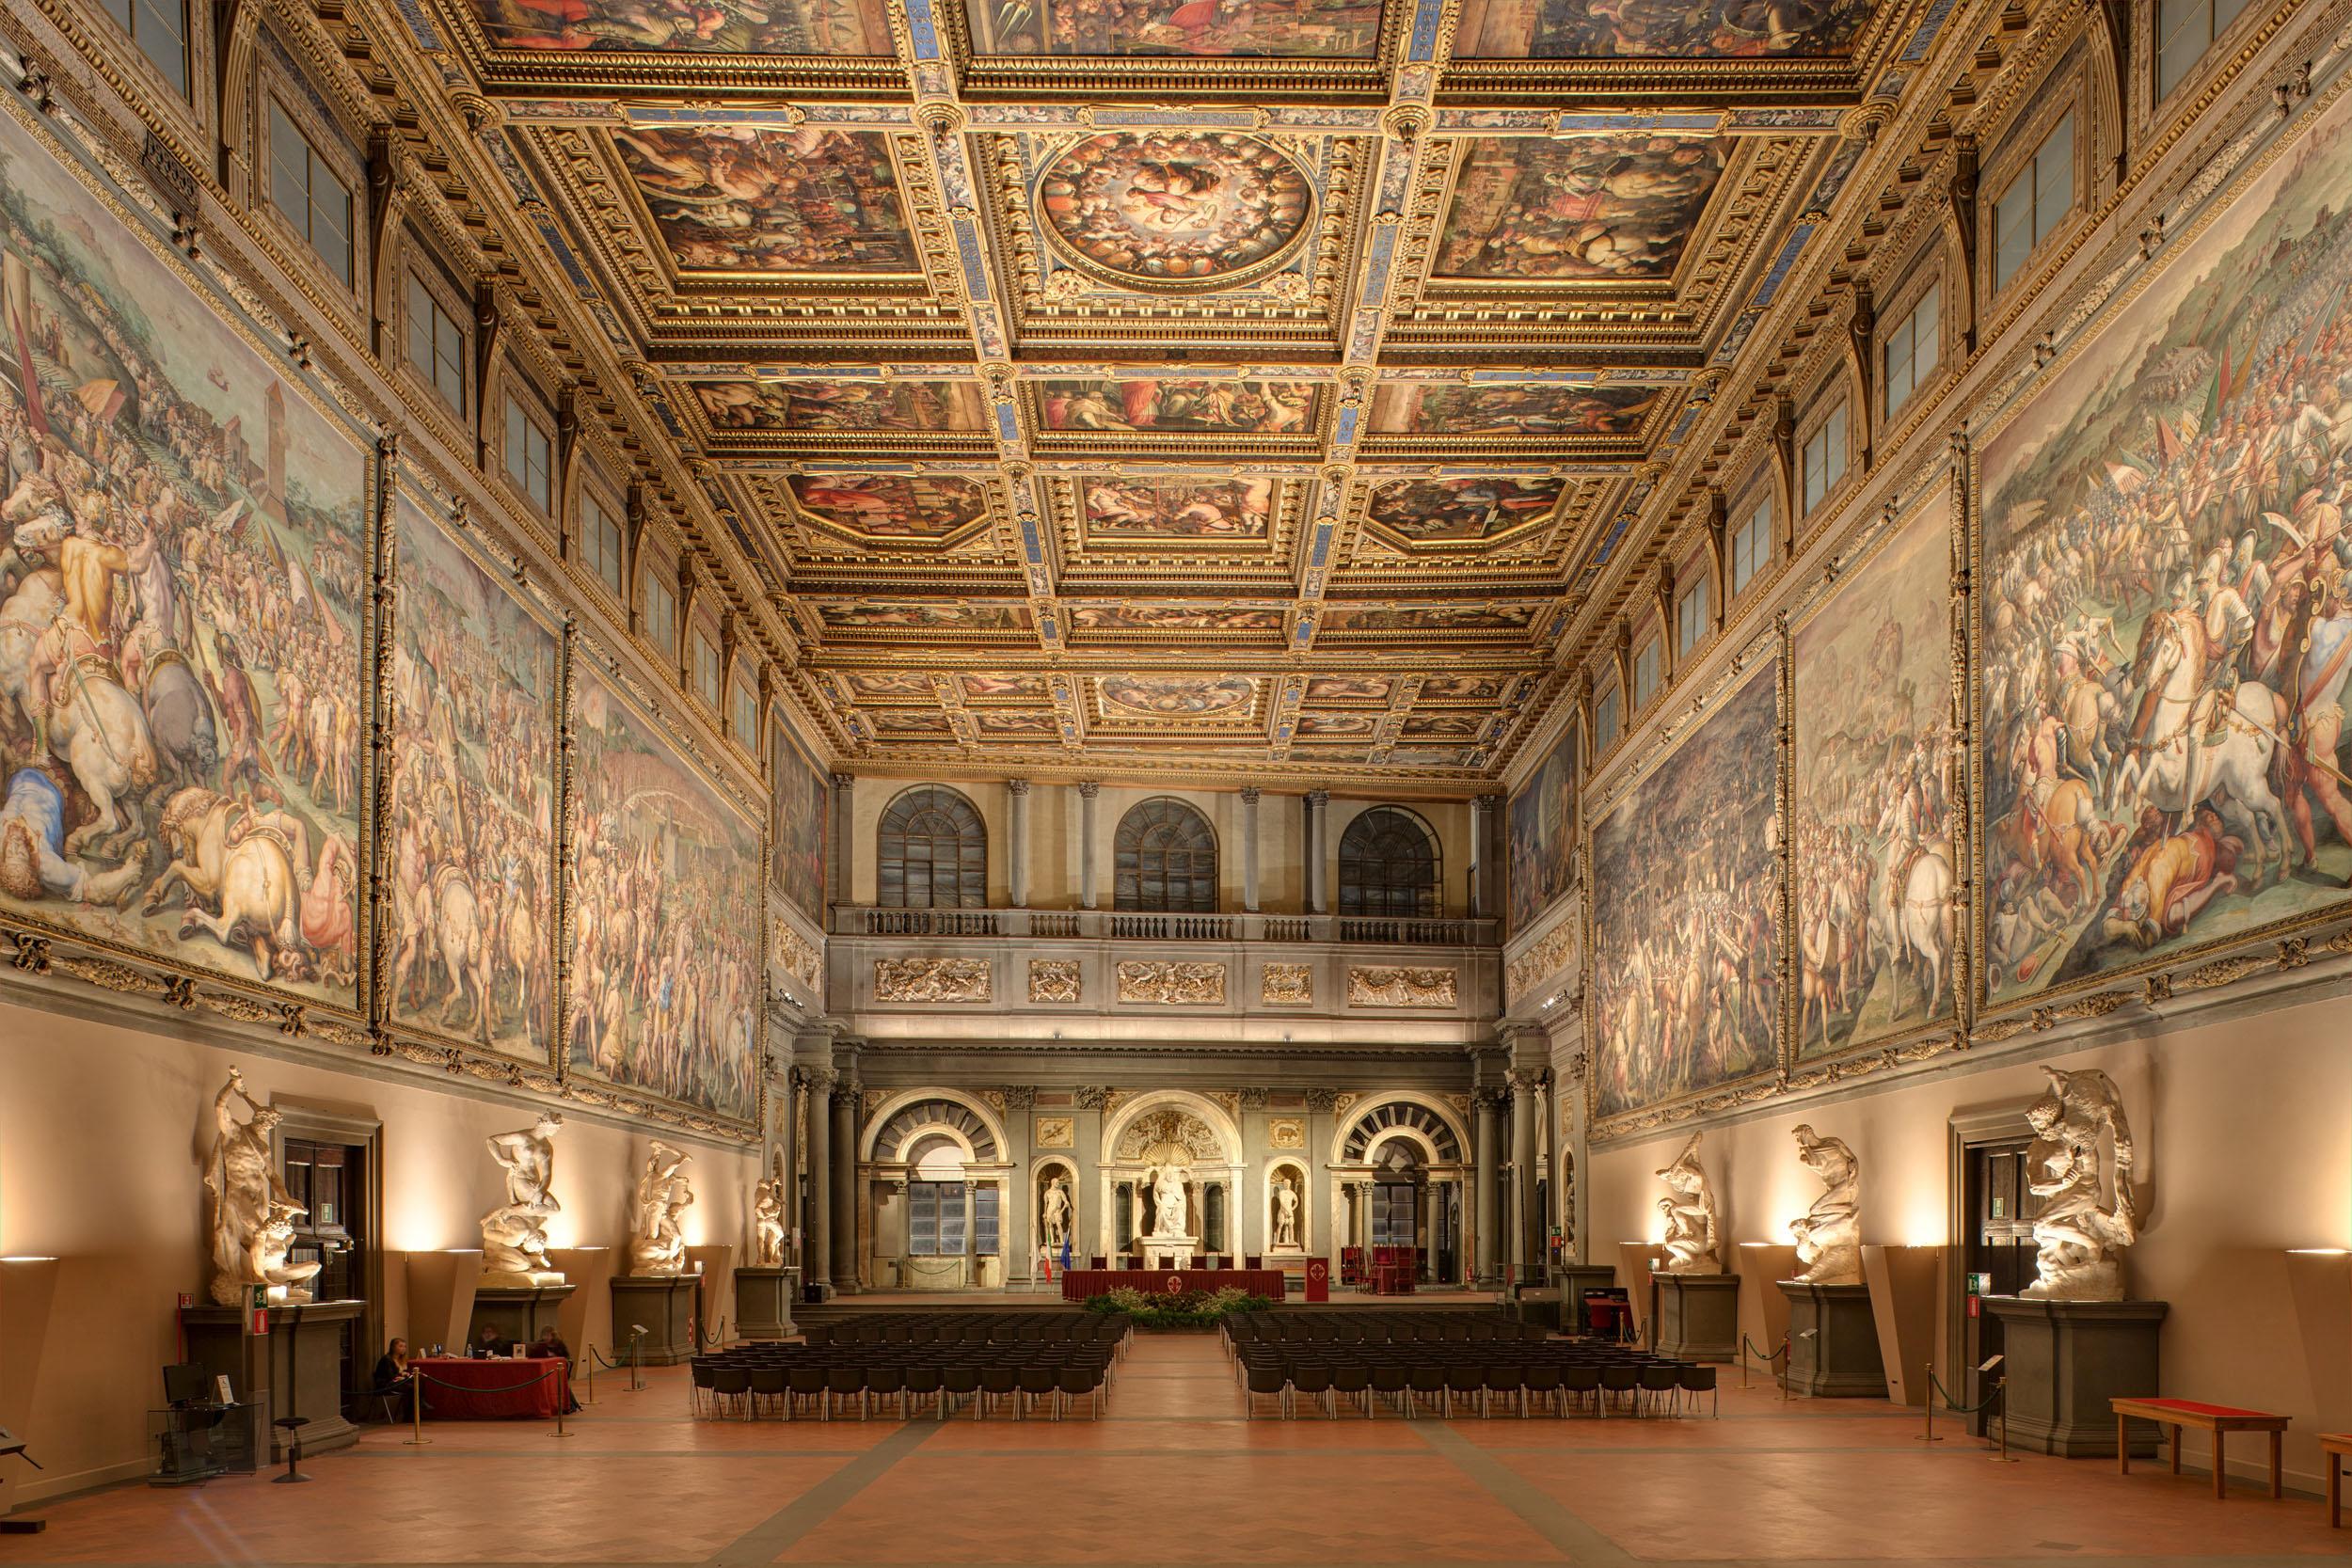 The Uffizi Gallery in Florence (courtesy of Targetti Sankey). originally designed by Giorgio Vasari and commissioned by Cosimo de Medici